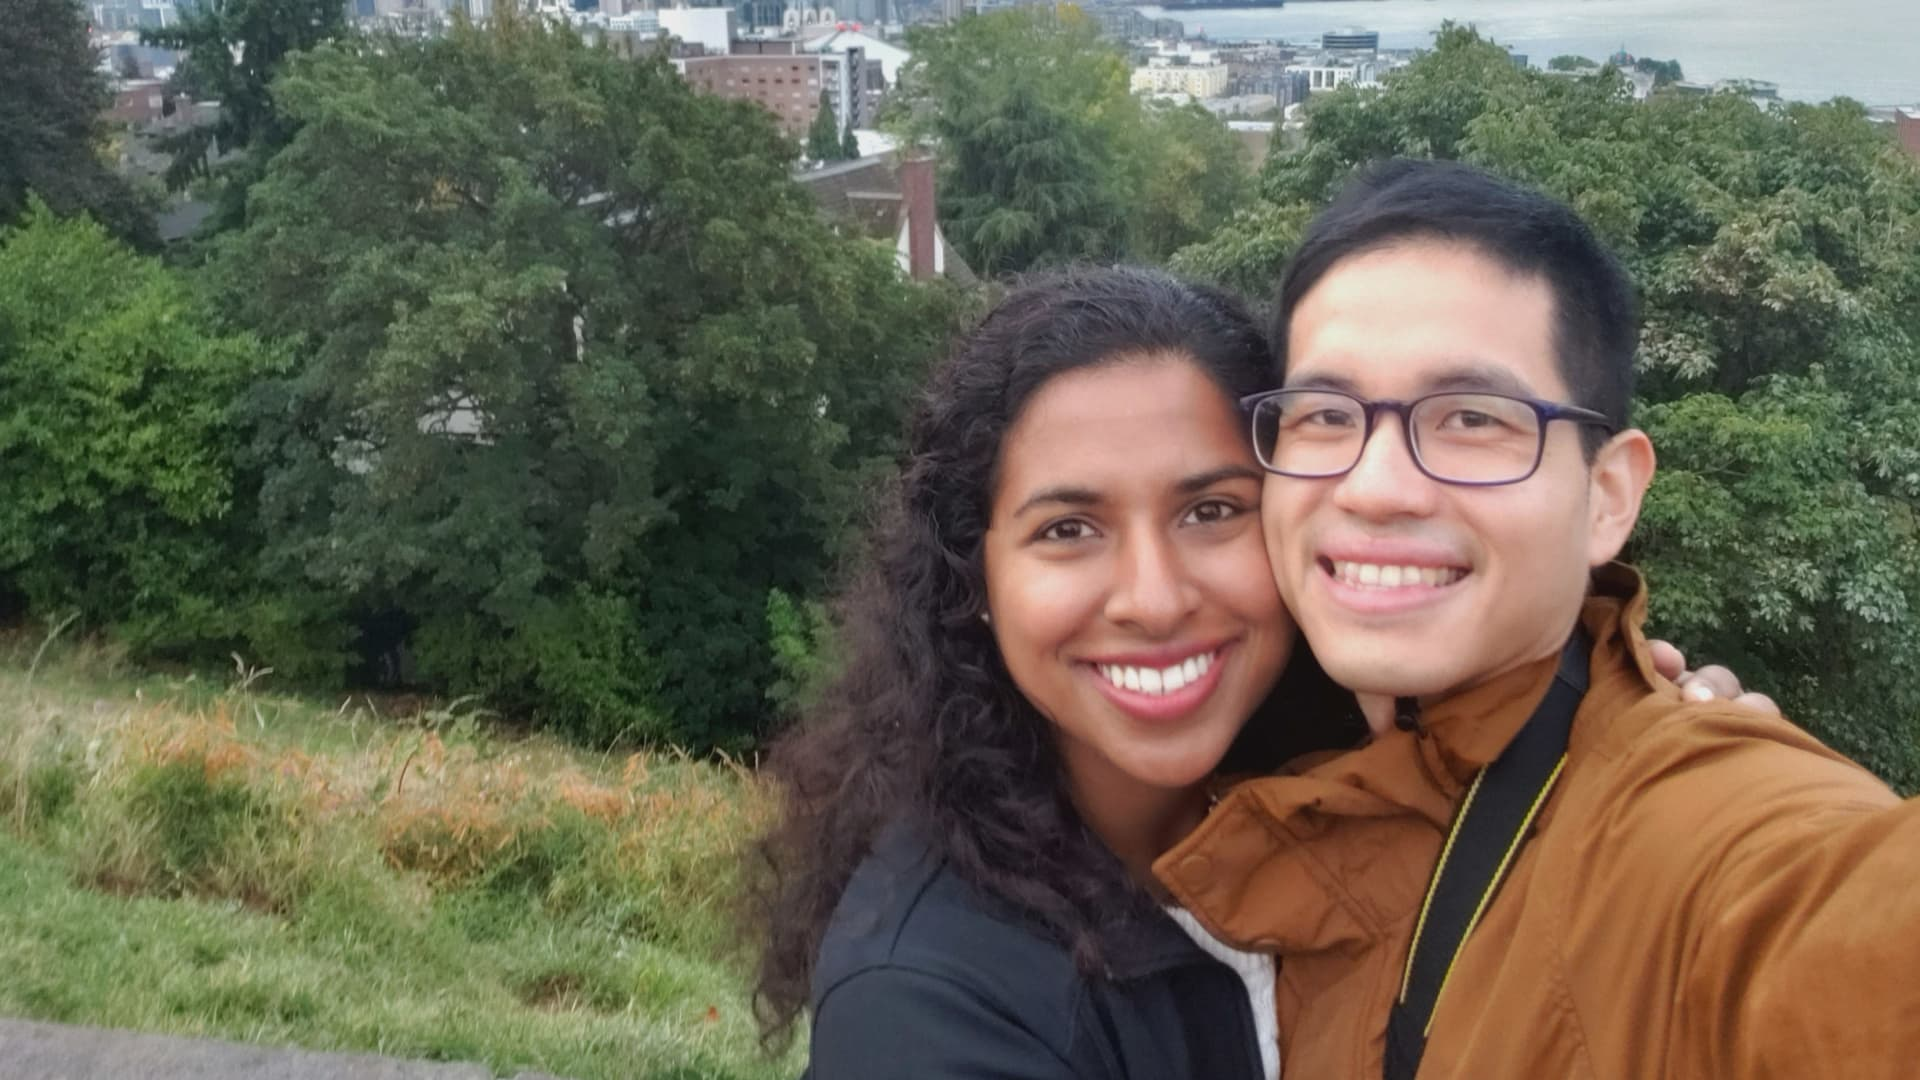 Chorath and Tiu enjoy the view in Seattle, Washington.